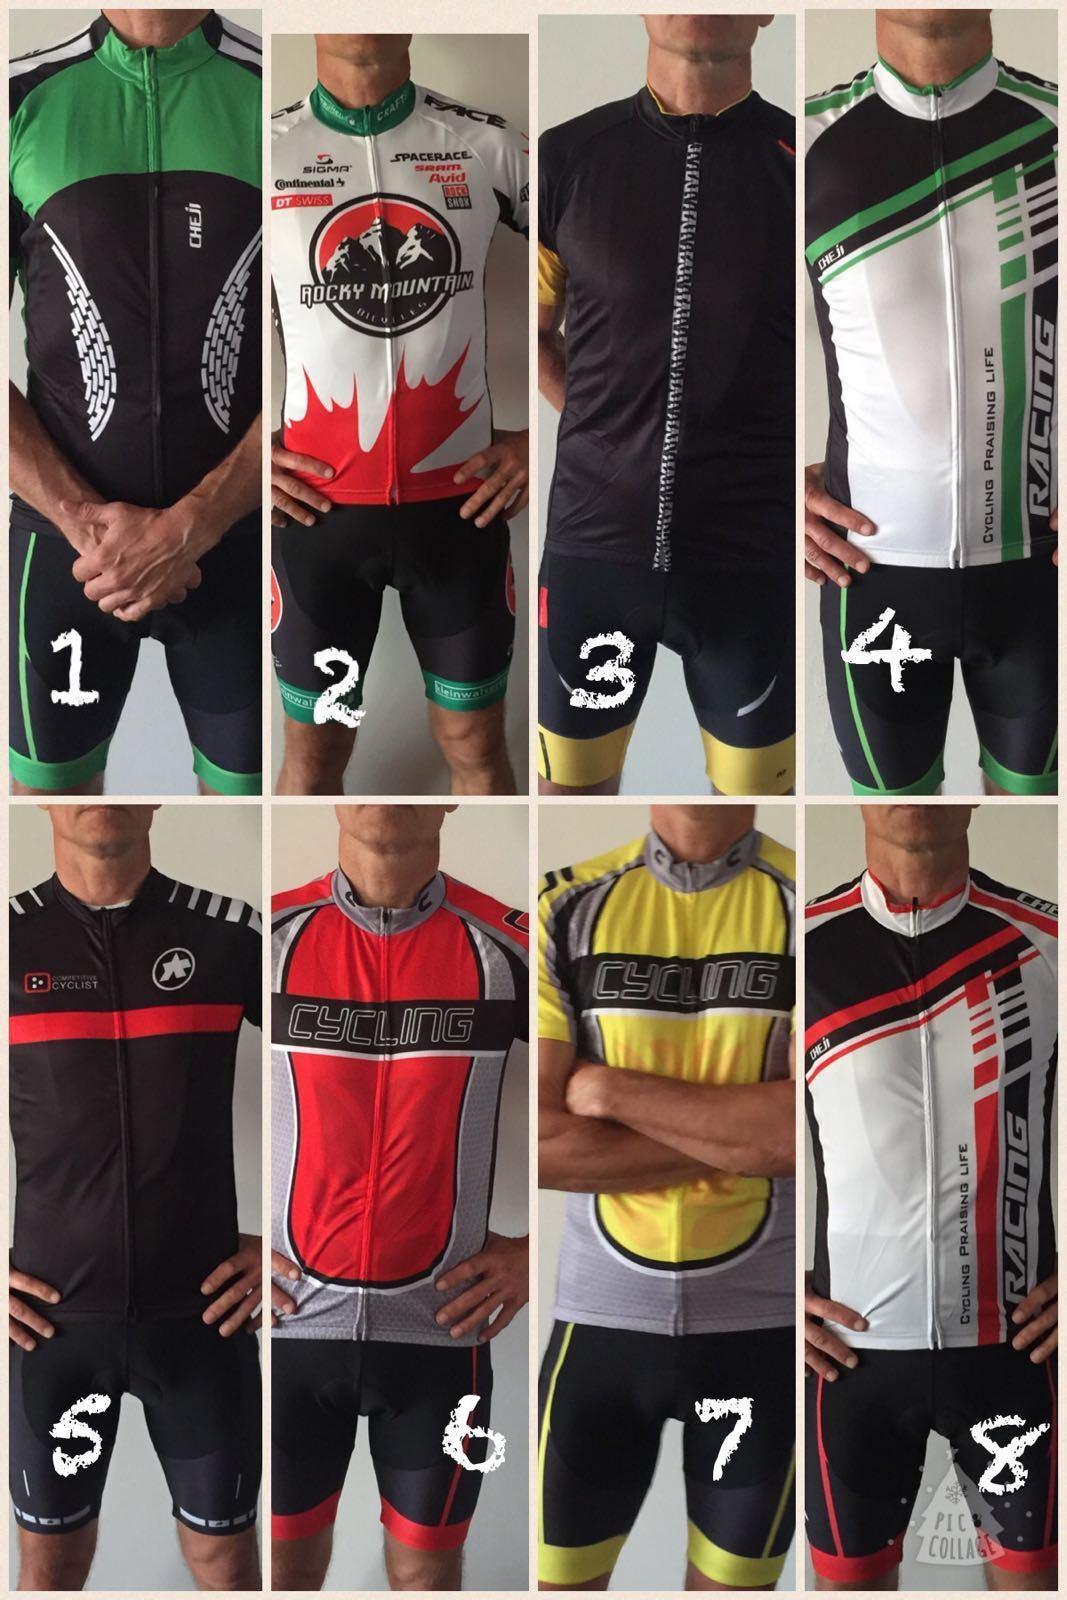 Completo ciclismo pantaloni salopette Bike jersey Bib short sport bici MTB BDC